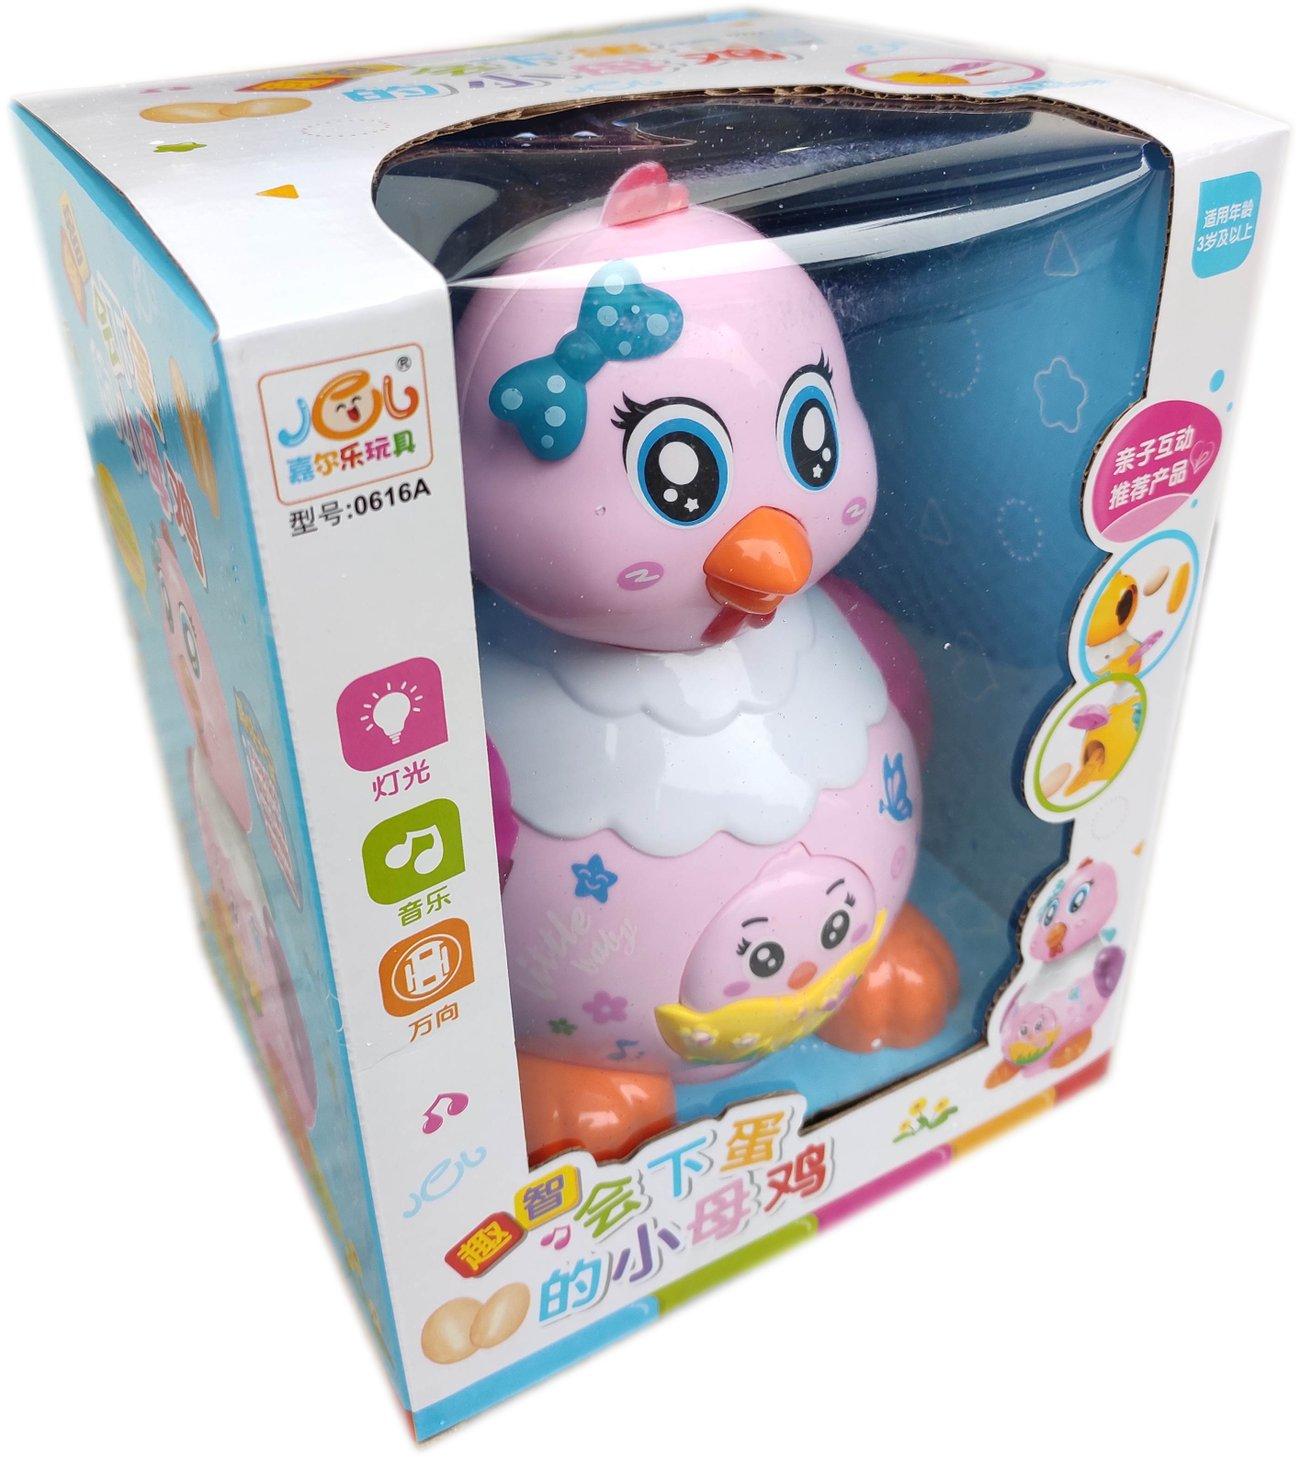 Детска занимателна играчка Кокошка с яйца със светлина и звук